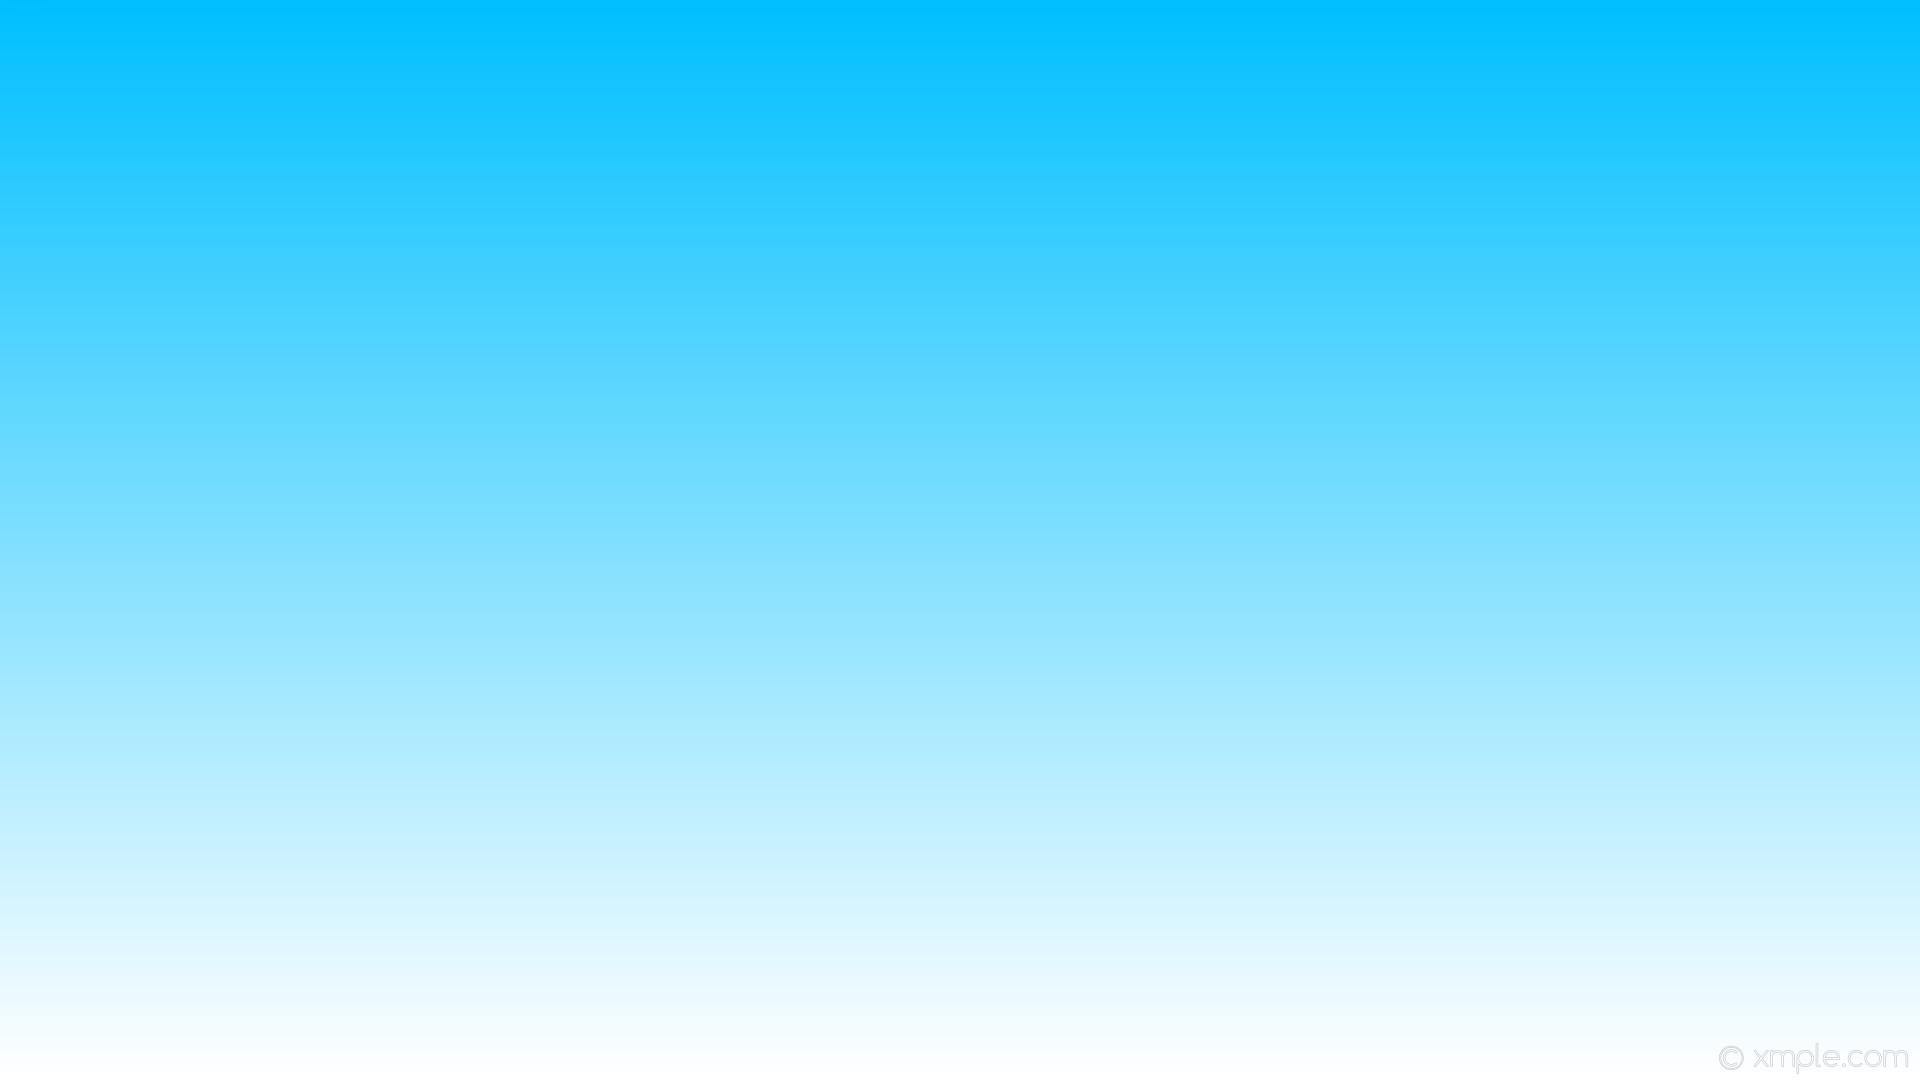 Res: 1920x1080, wallpaper white blue gradient linear deep sky blue #ffffff #00bfff 270°